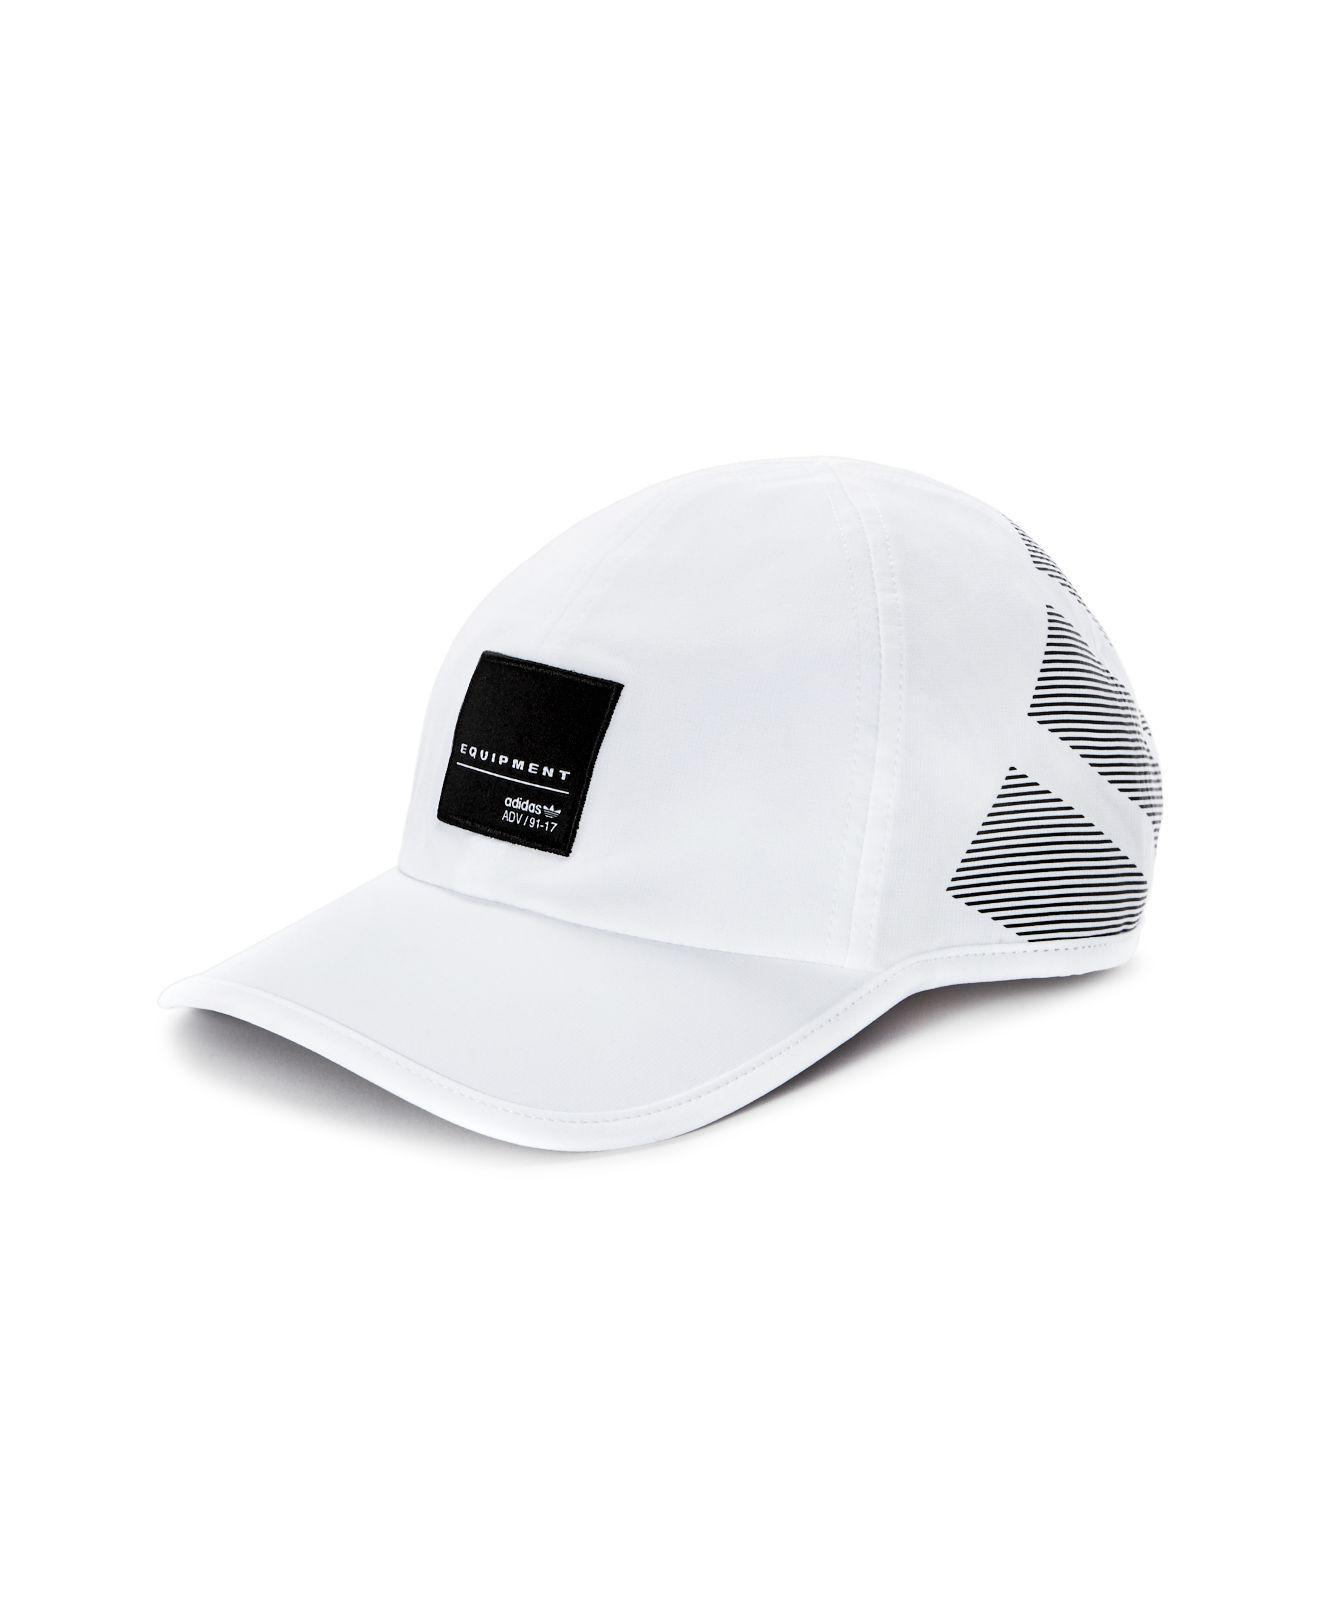 b9f30f9fd6b Lyst - adidas Originals Eqt Training Hat in White for Men